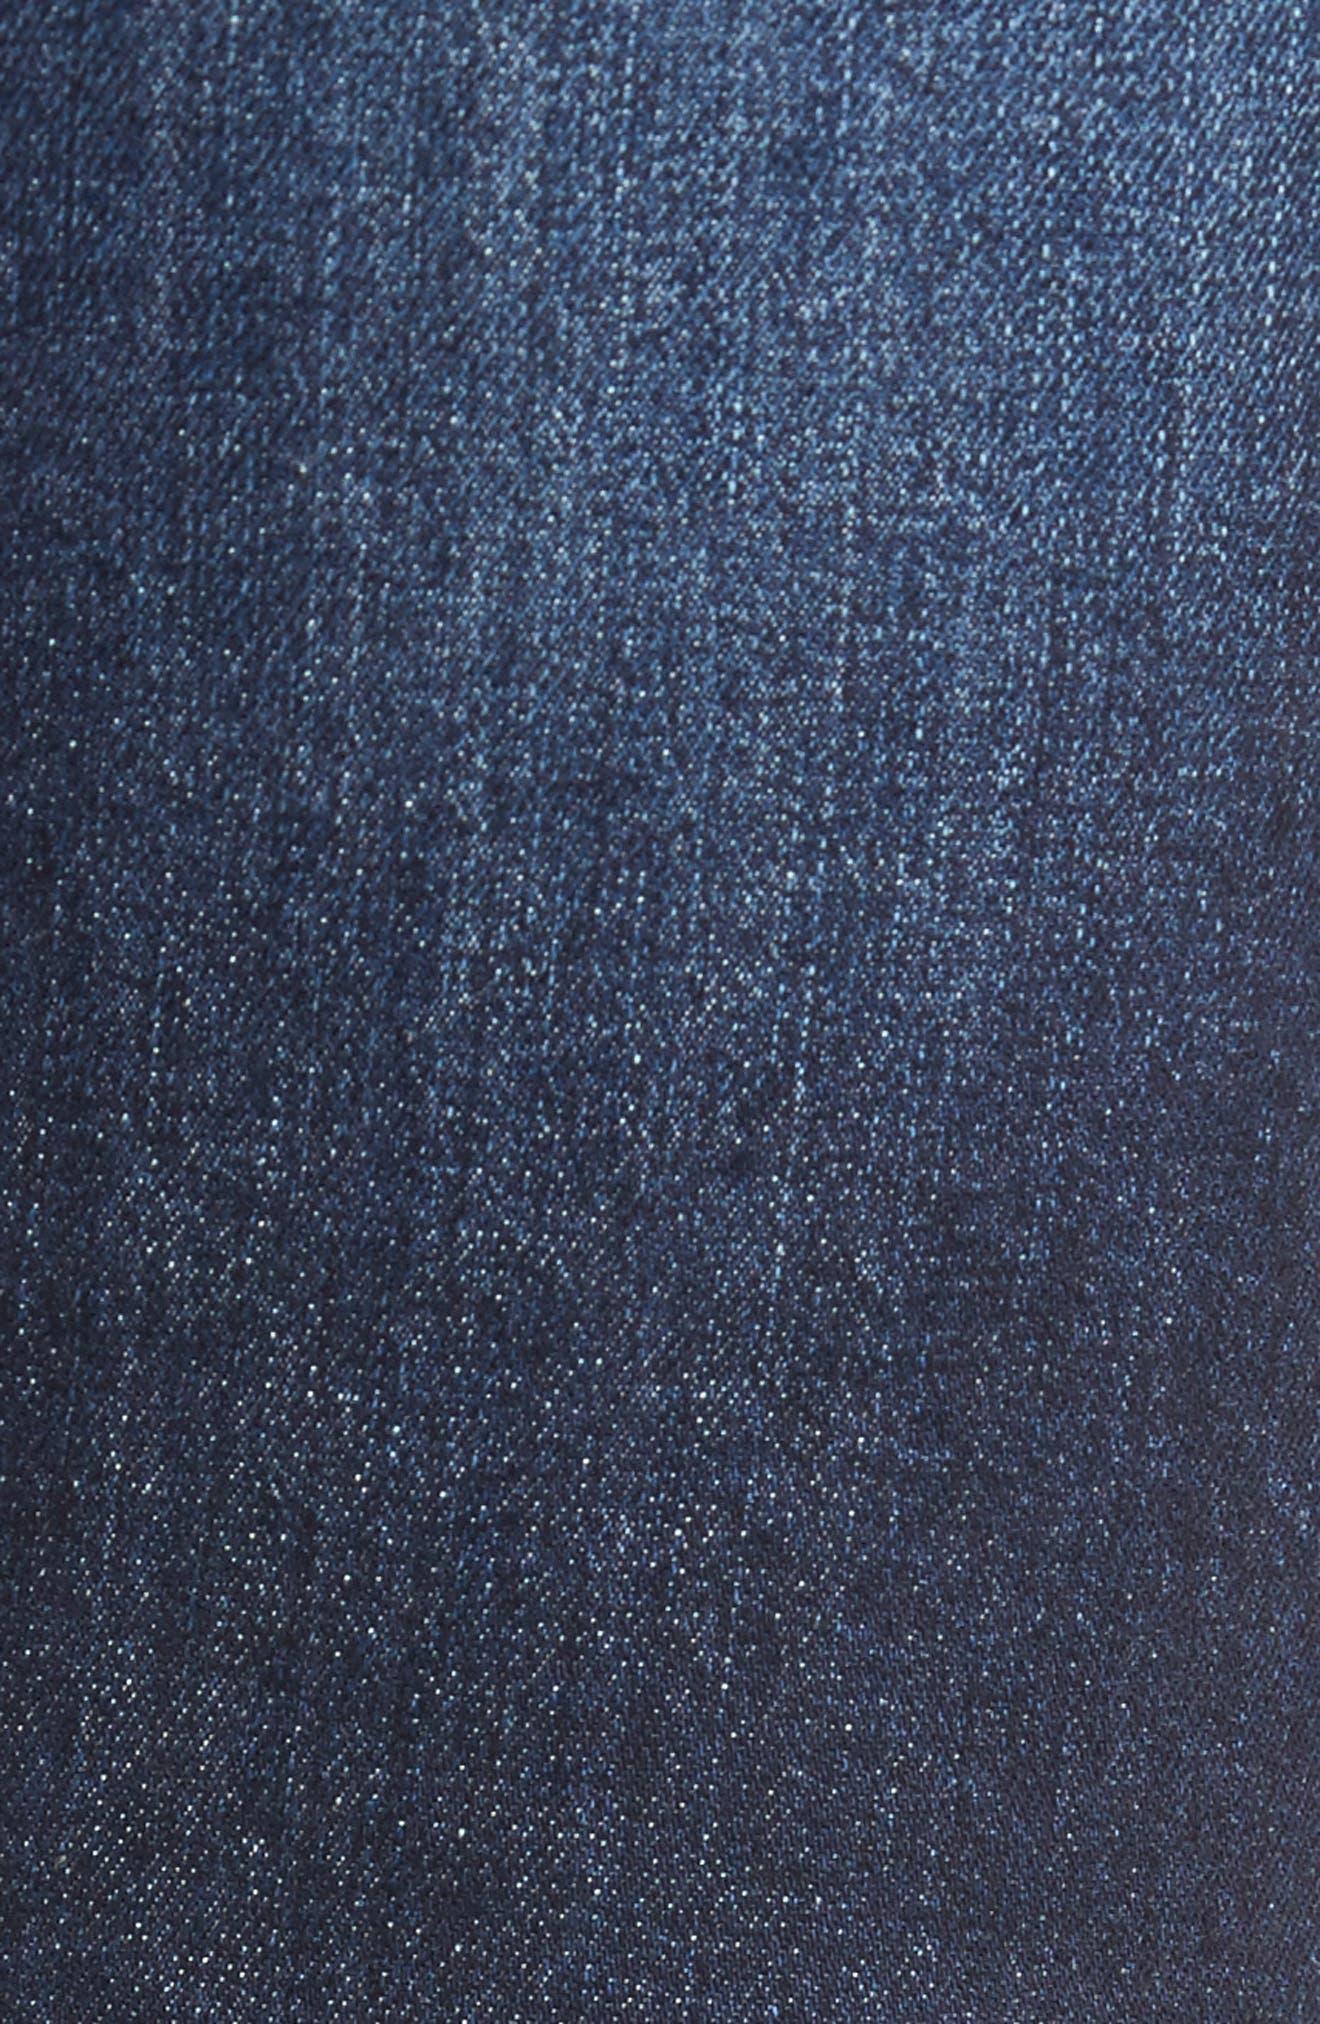 Windsor Slim Fit Jeans,                             Alternate thumbnail 5, color,                             Dark Blue